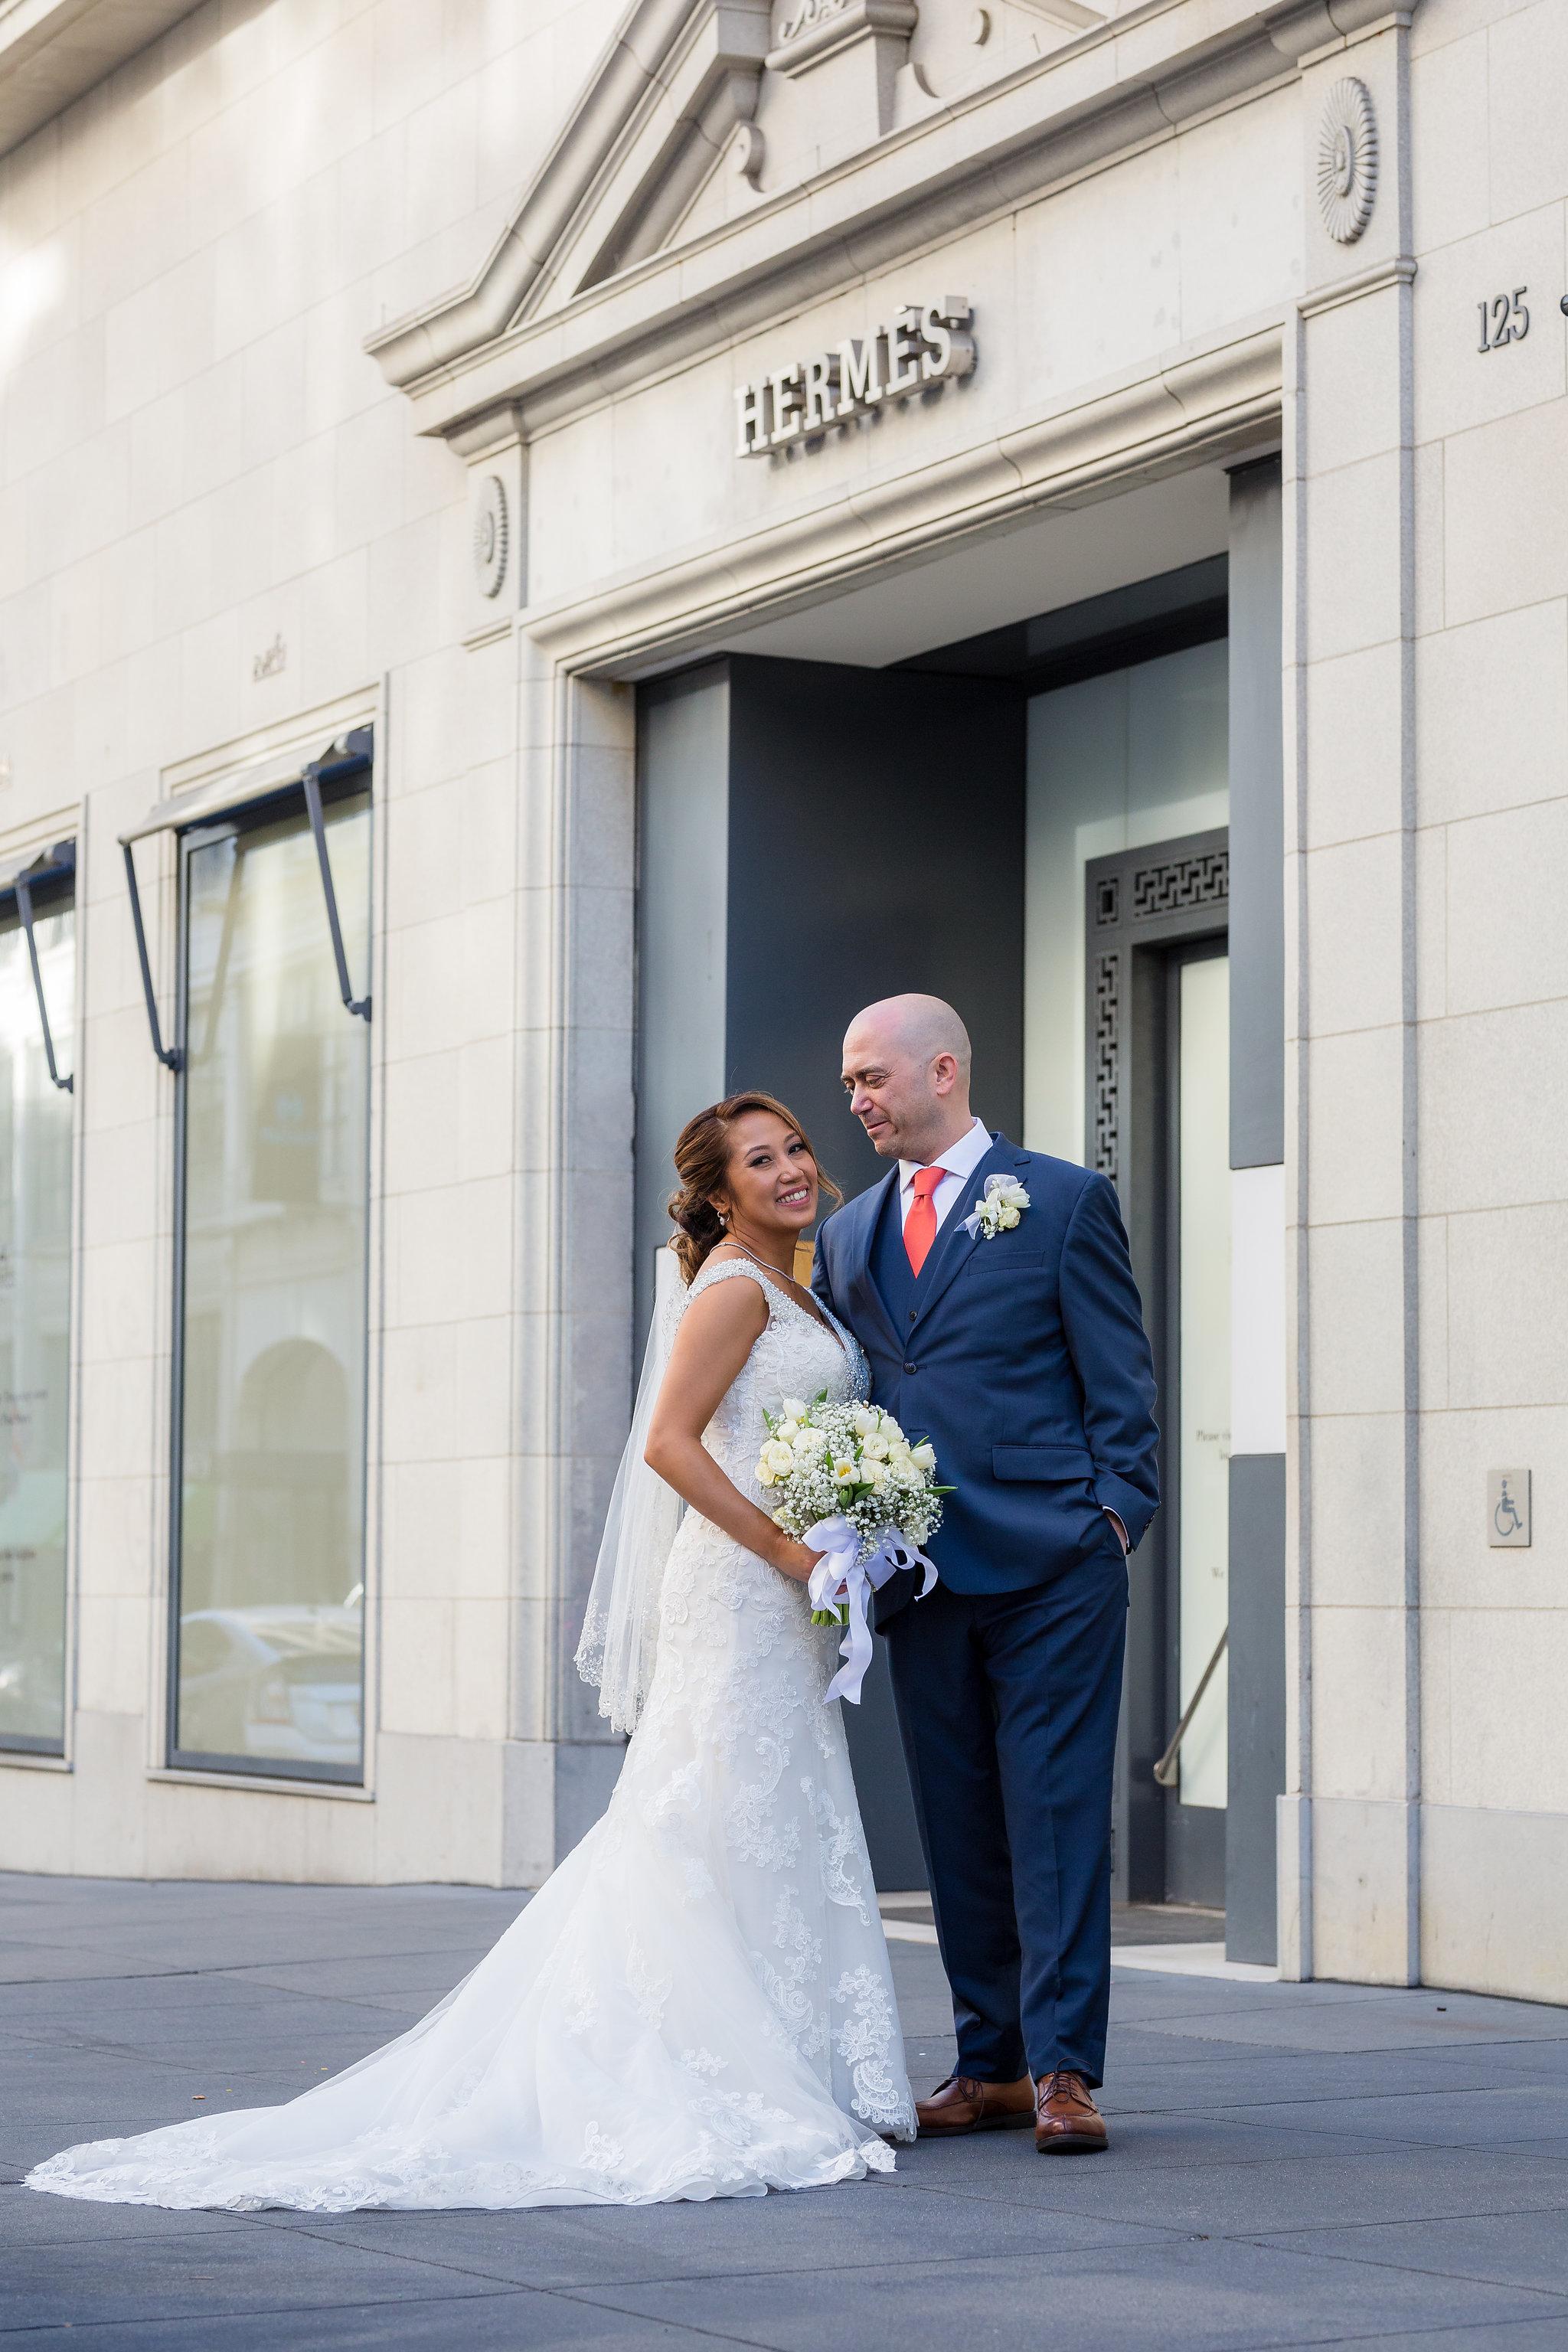 union square wedding photography-11.jpg